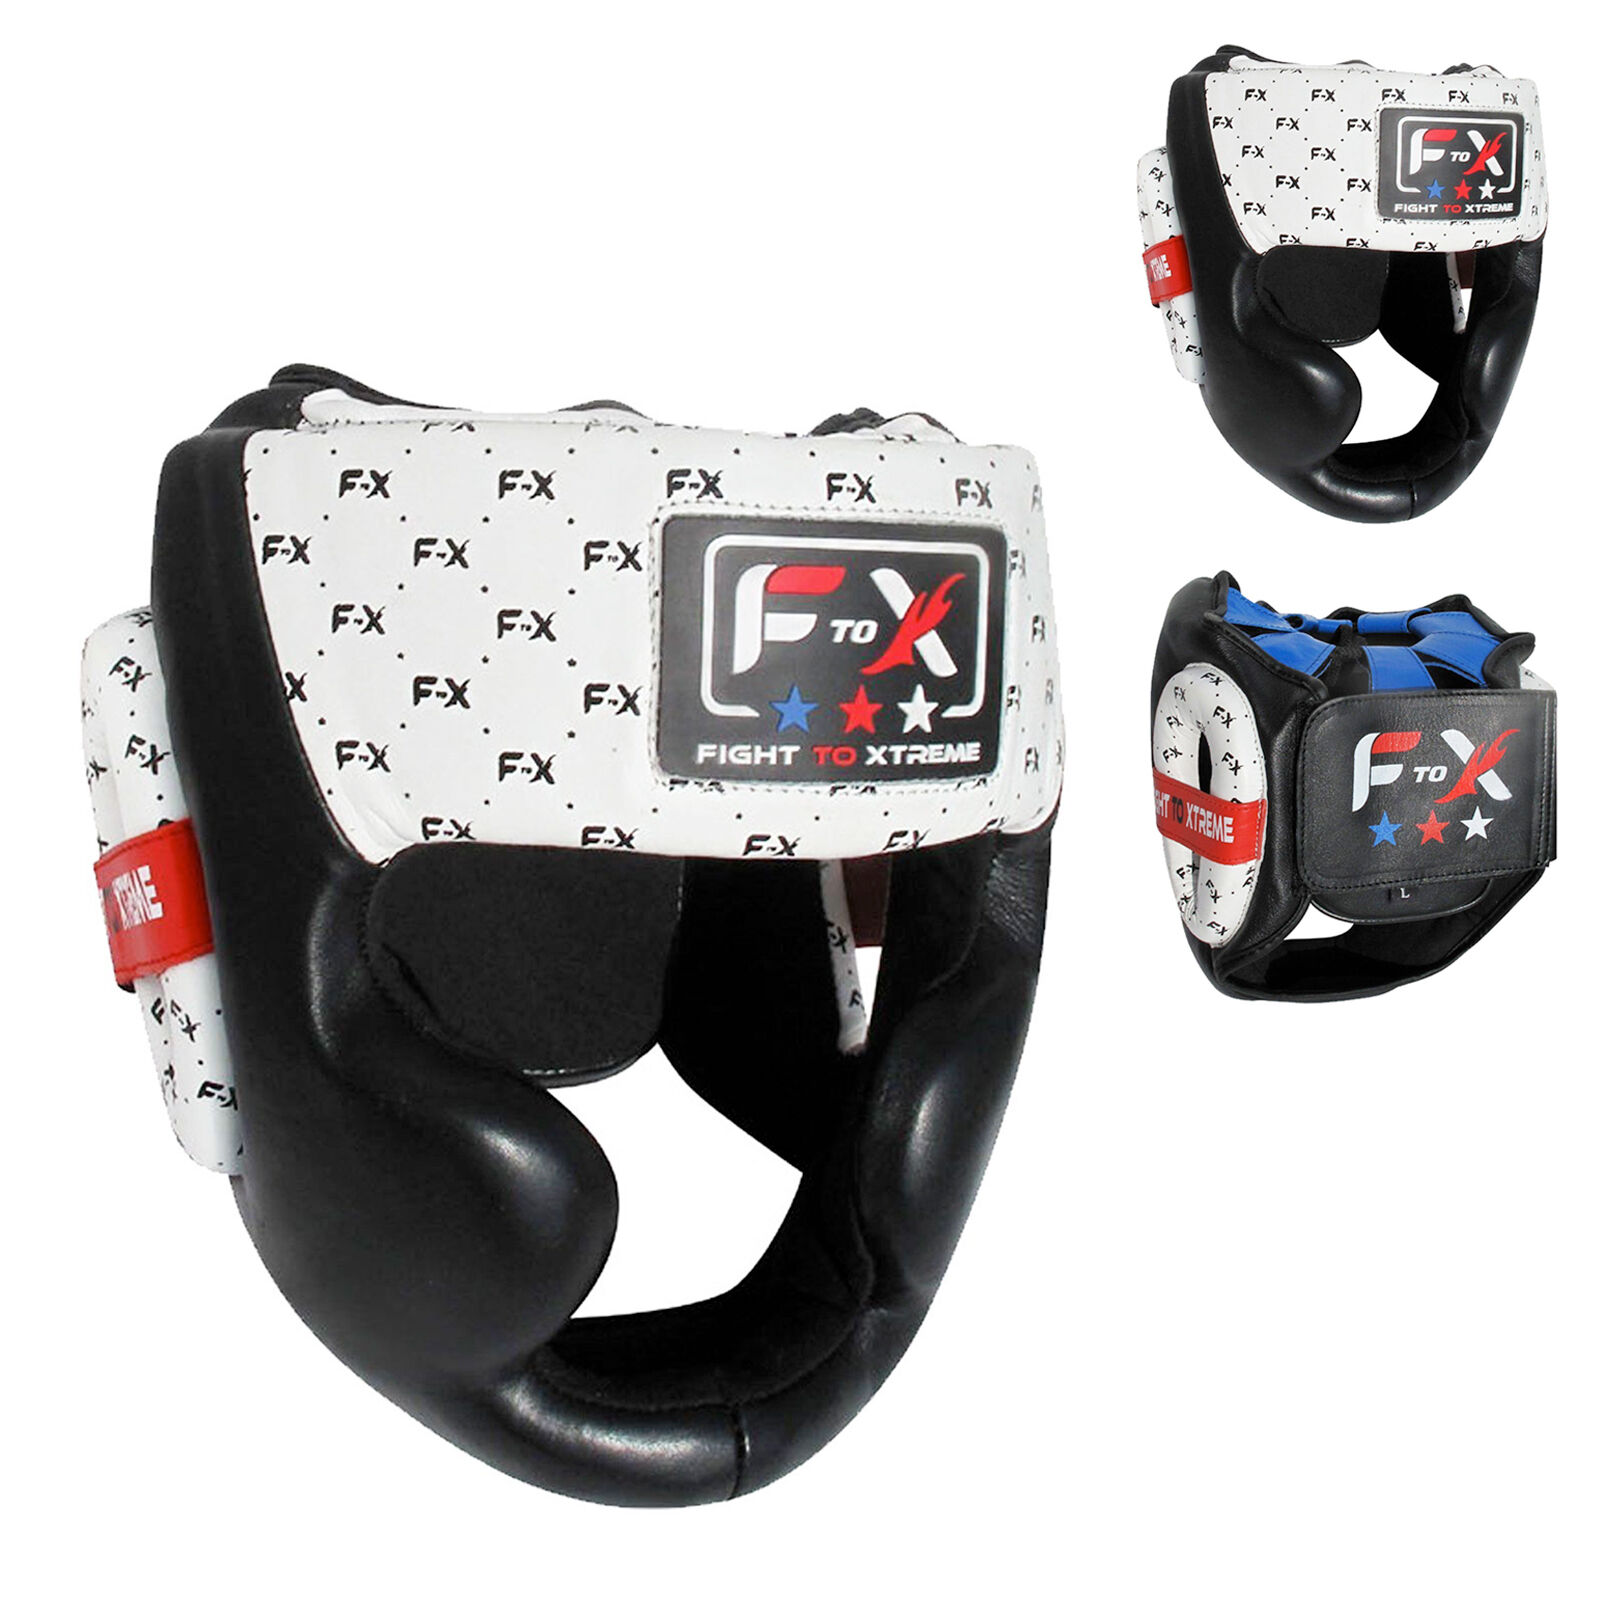 Sporteq Boxen Kopf-Garde Helm Kopfschmuck Kopfschmuck Kopfschmuck Training Mma Kickboxen Gesichtschutz 02af4a